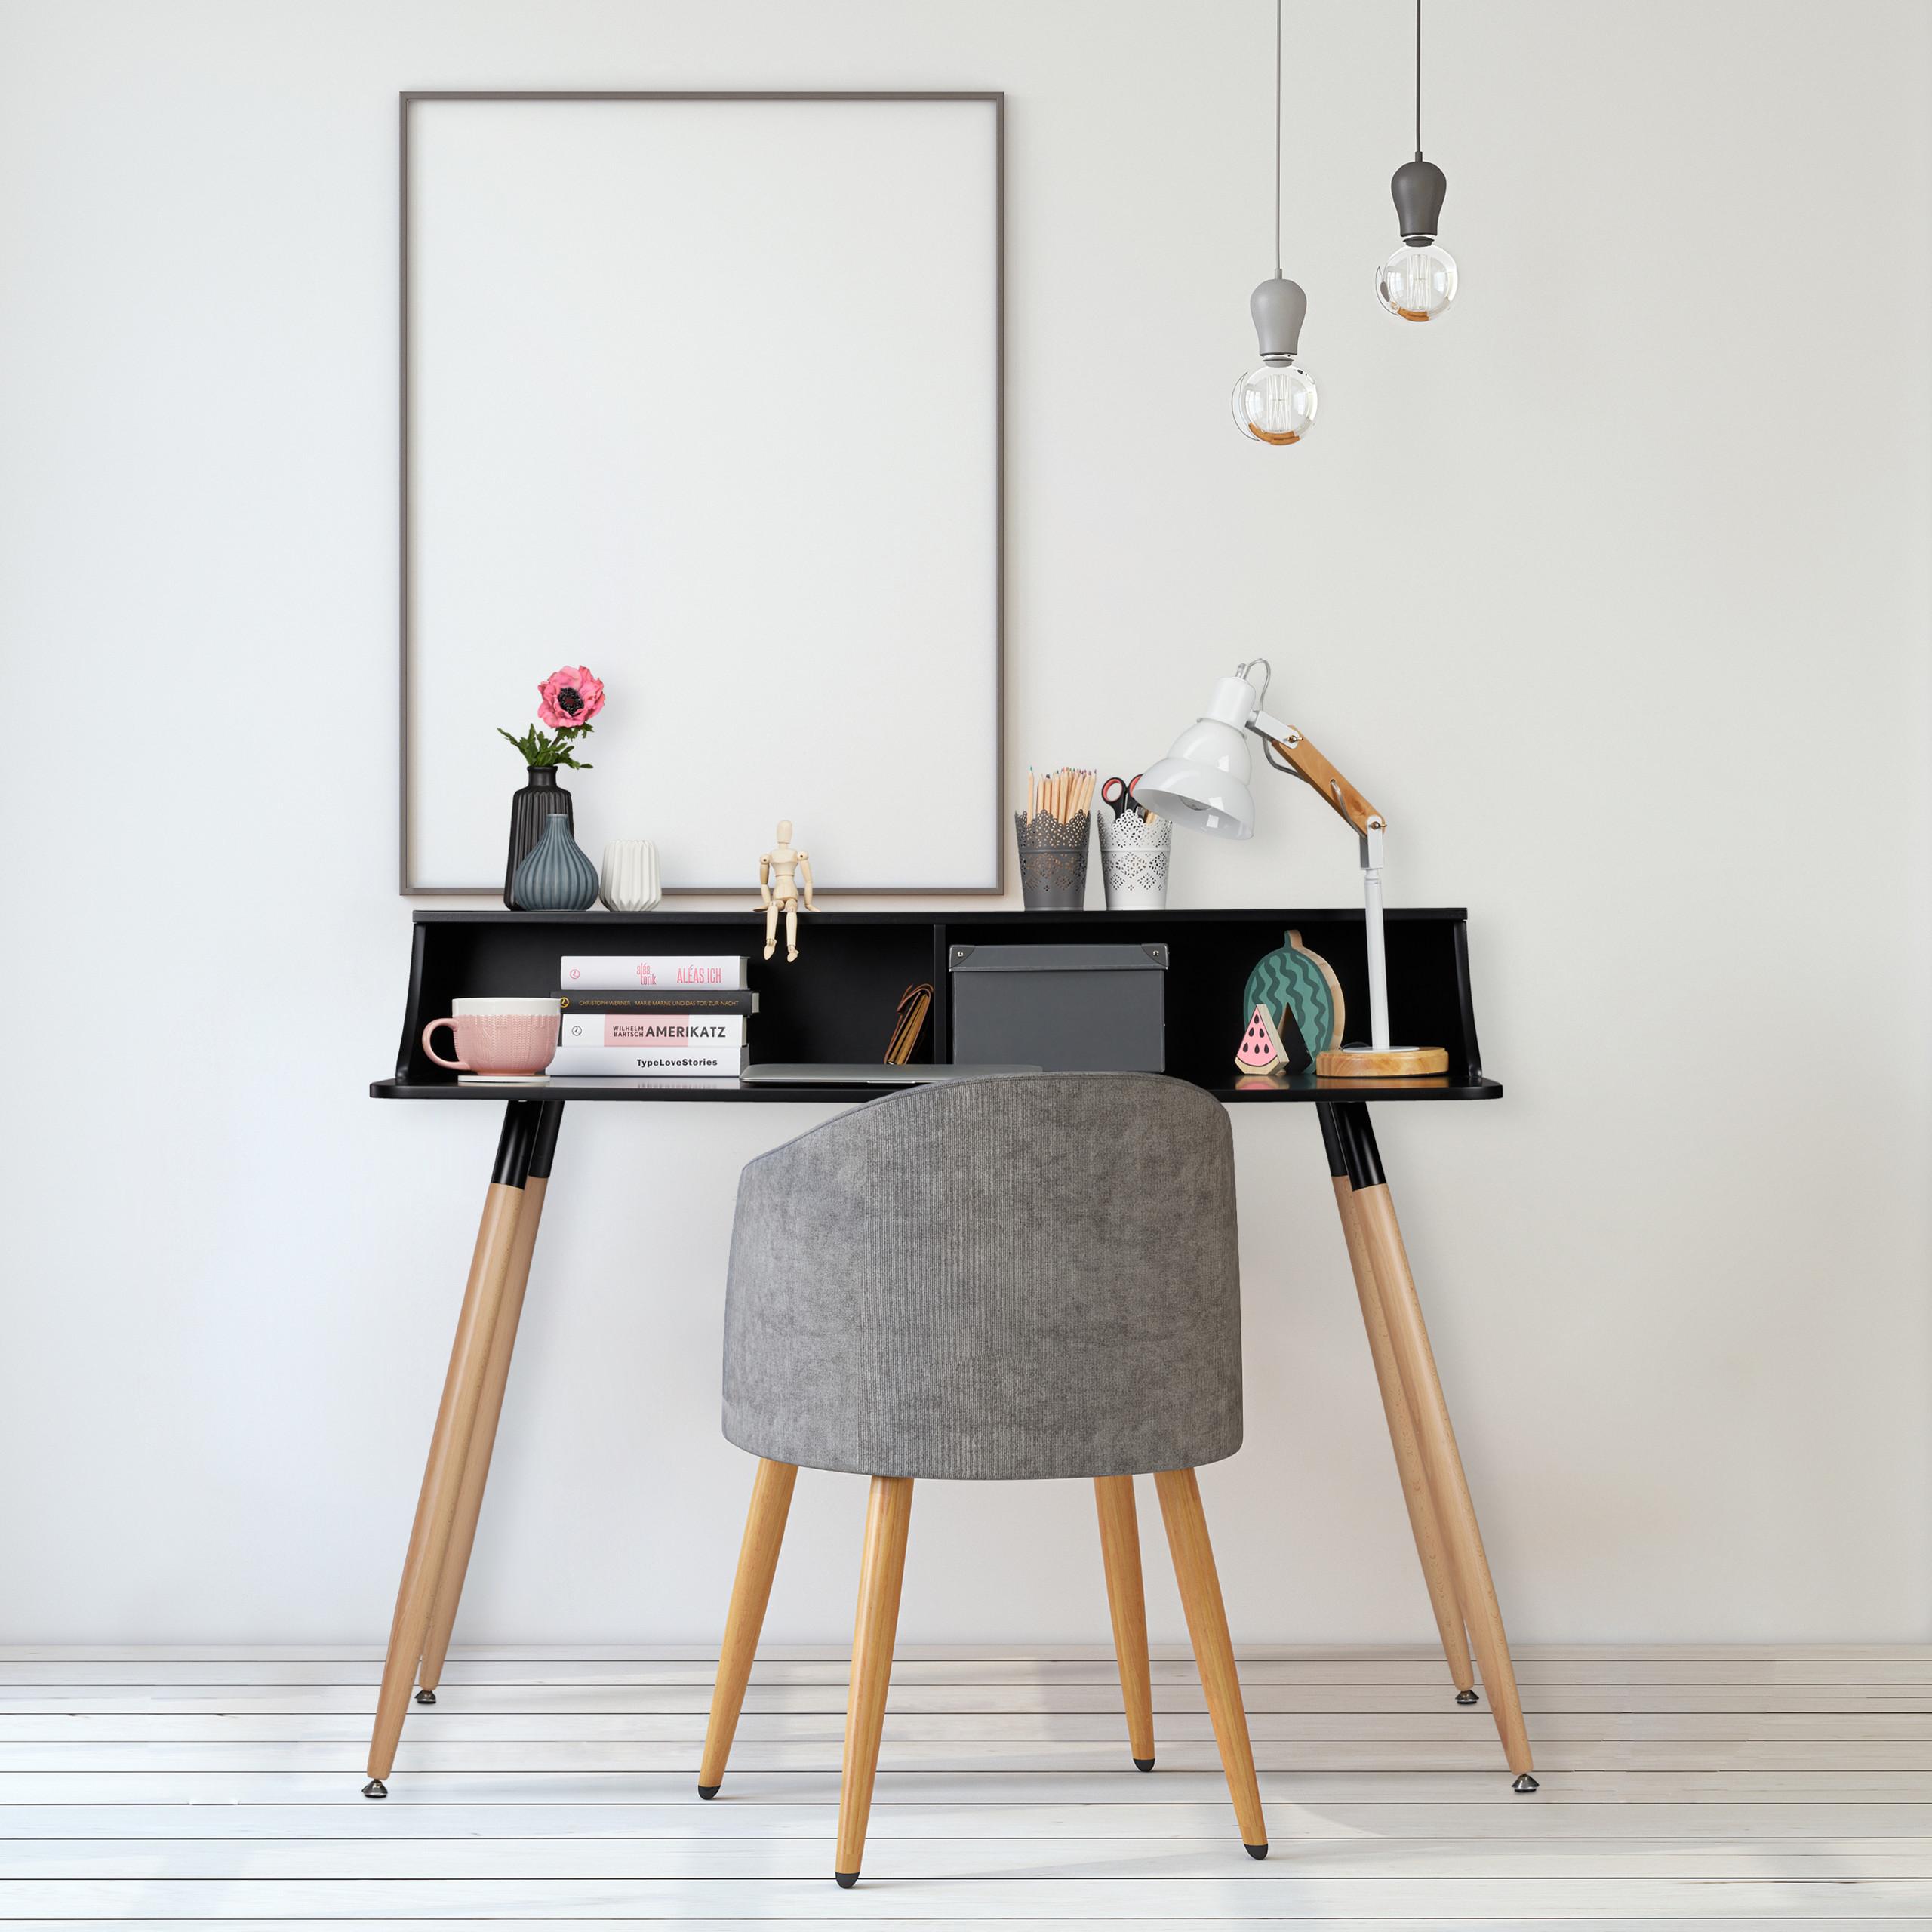 bureau-kinderbureau-ruimtebesparend-75-cm-hoog-laptoptafel-120-breed miniatuur 13